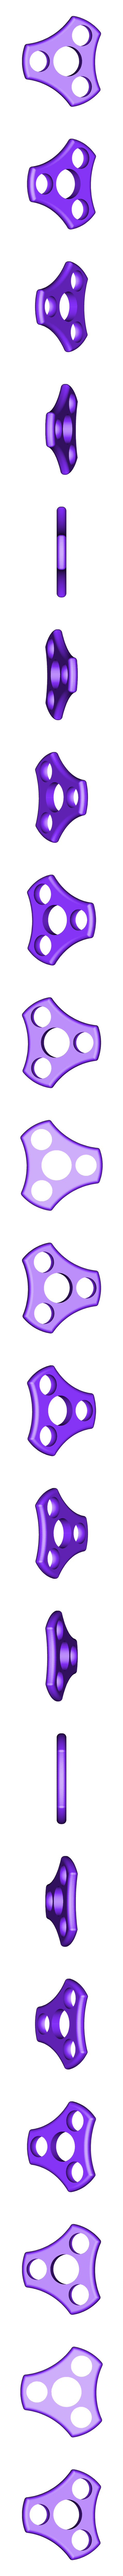 Fidget.stl Download free STL file Compact Fidget Spinner • 3D print design, MakersBox